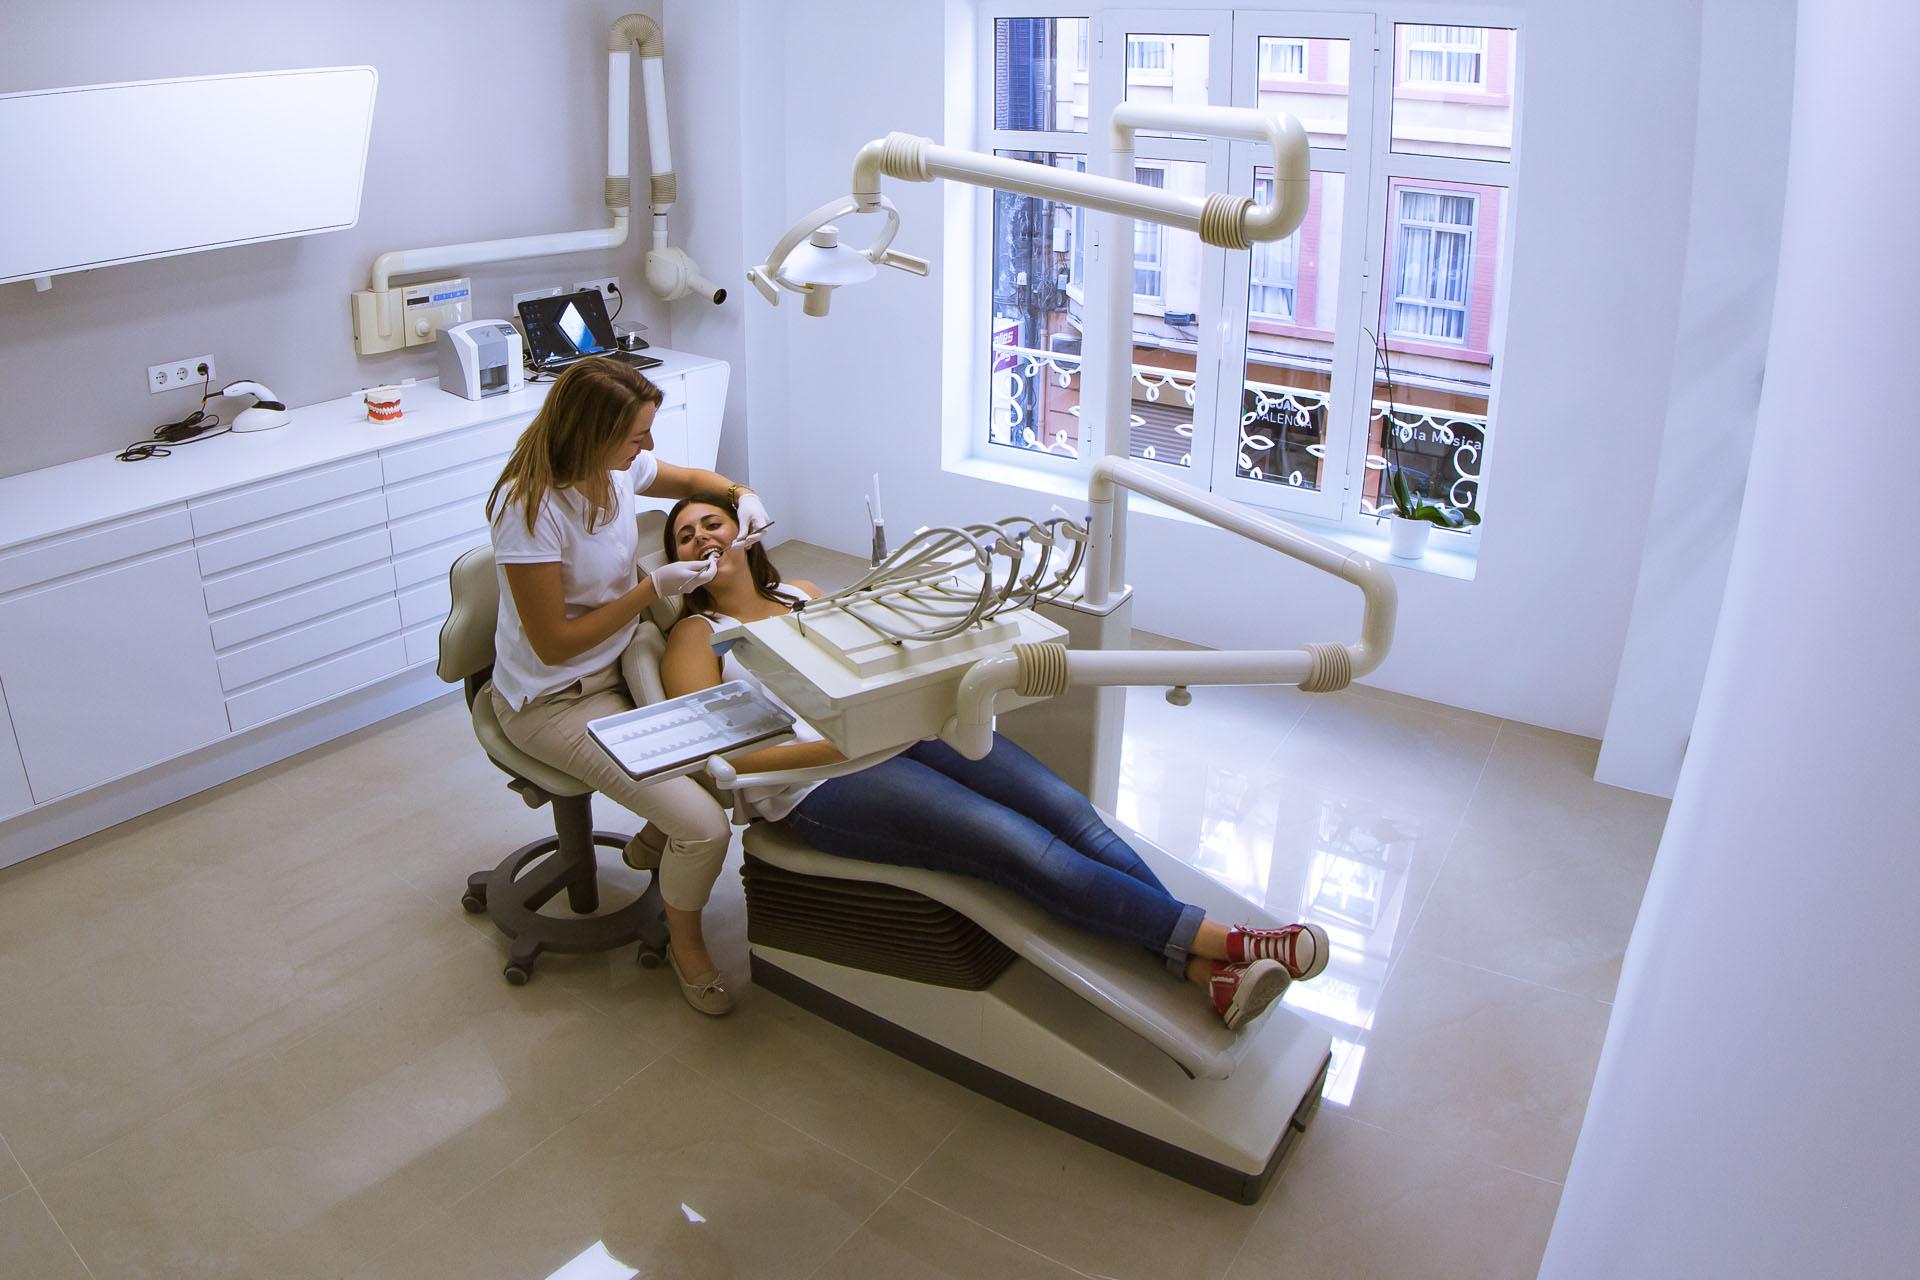 Contacta dentista en valencia cl nica dental segovia en - Clinica dental segovia ...